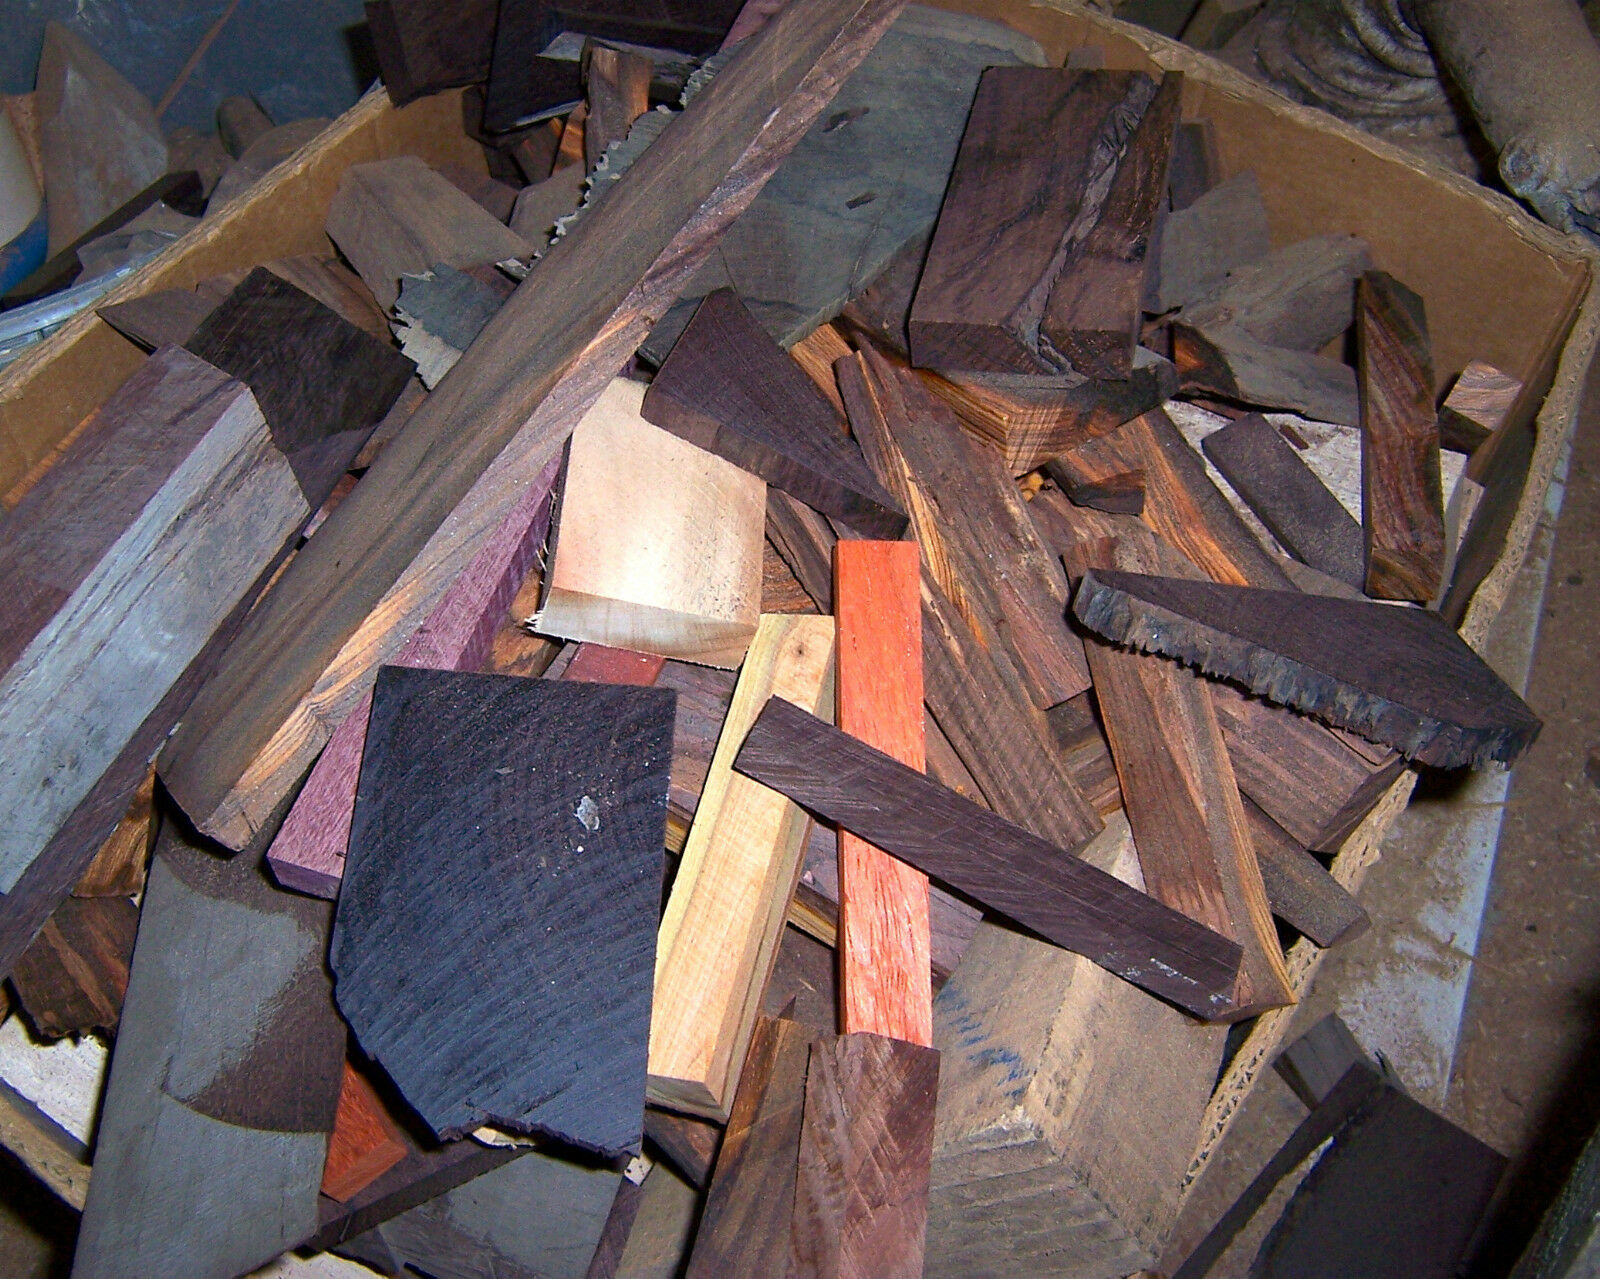 Woodturning Ver.hölzer Rester Noble Wood,Wood Turning Blanks,Pen